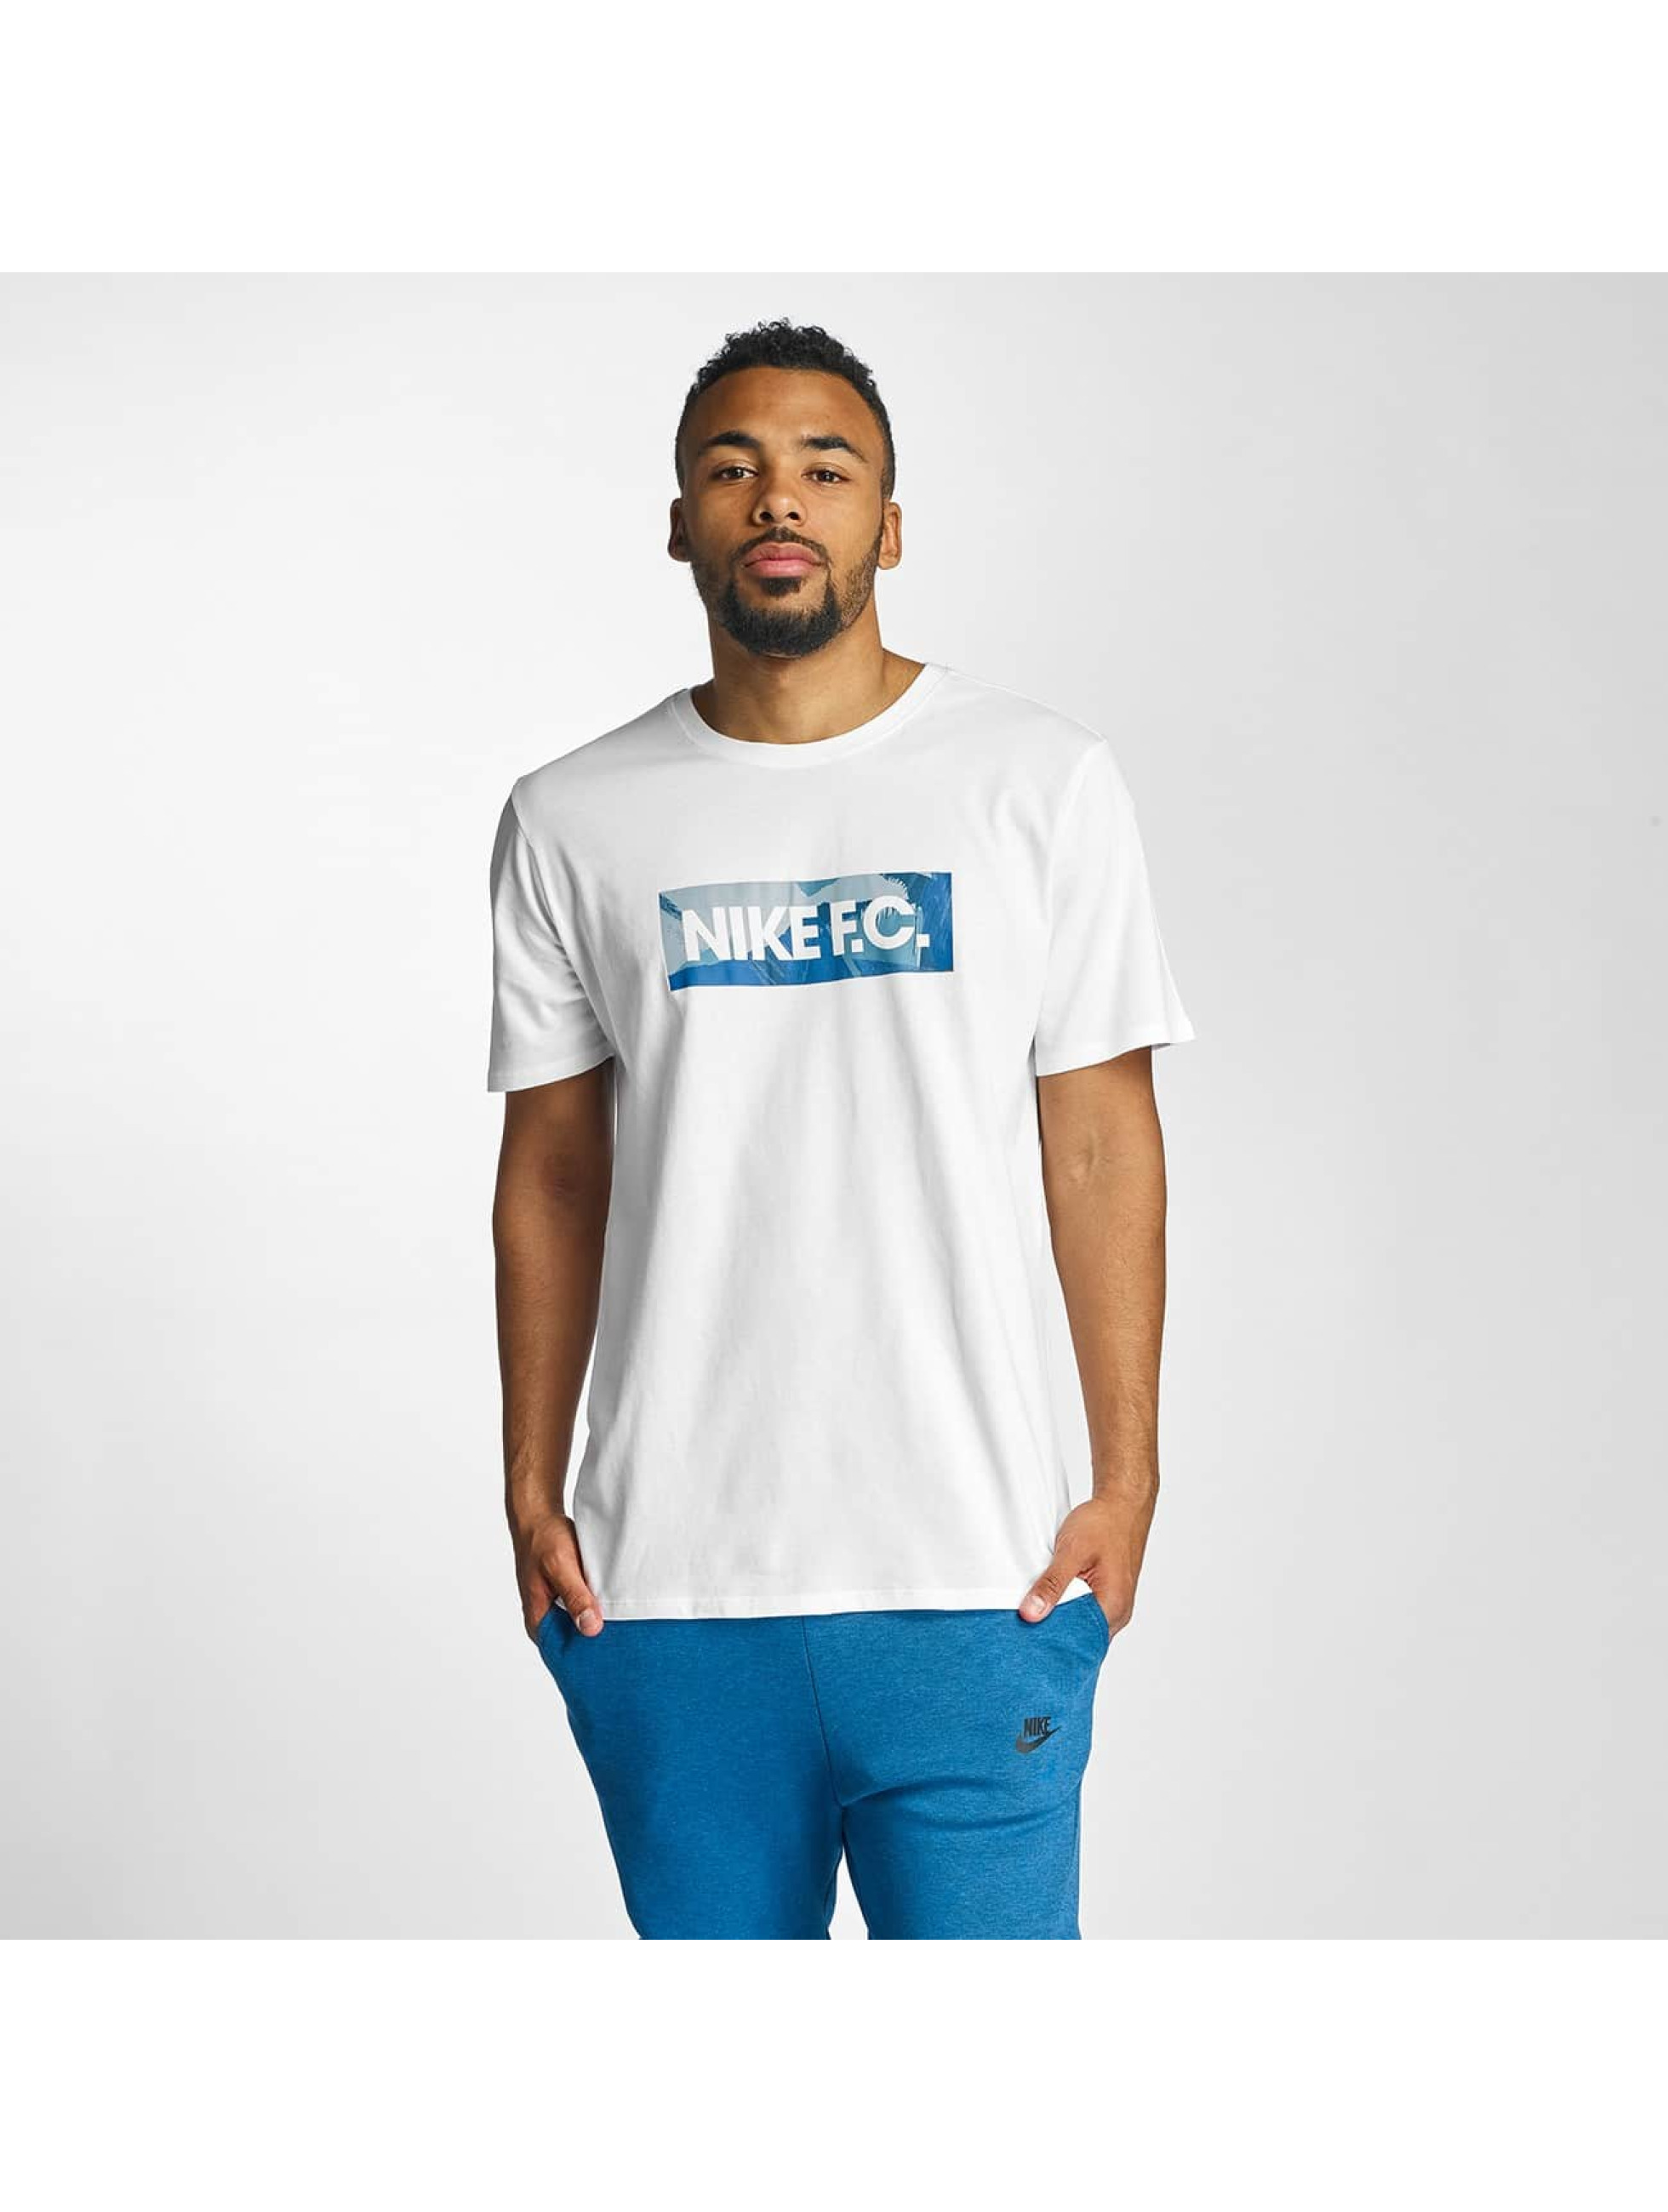 Nike Tričká FC 1 biela